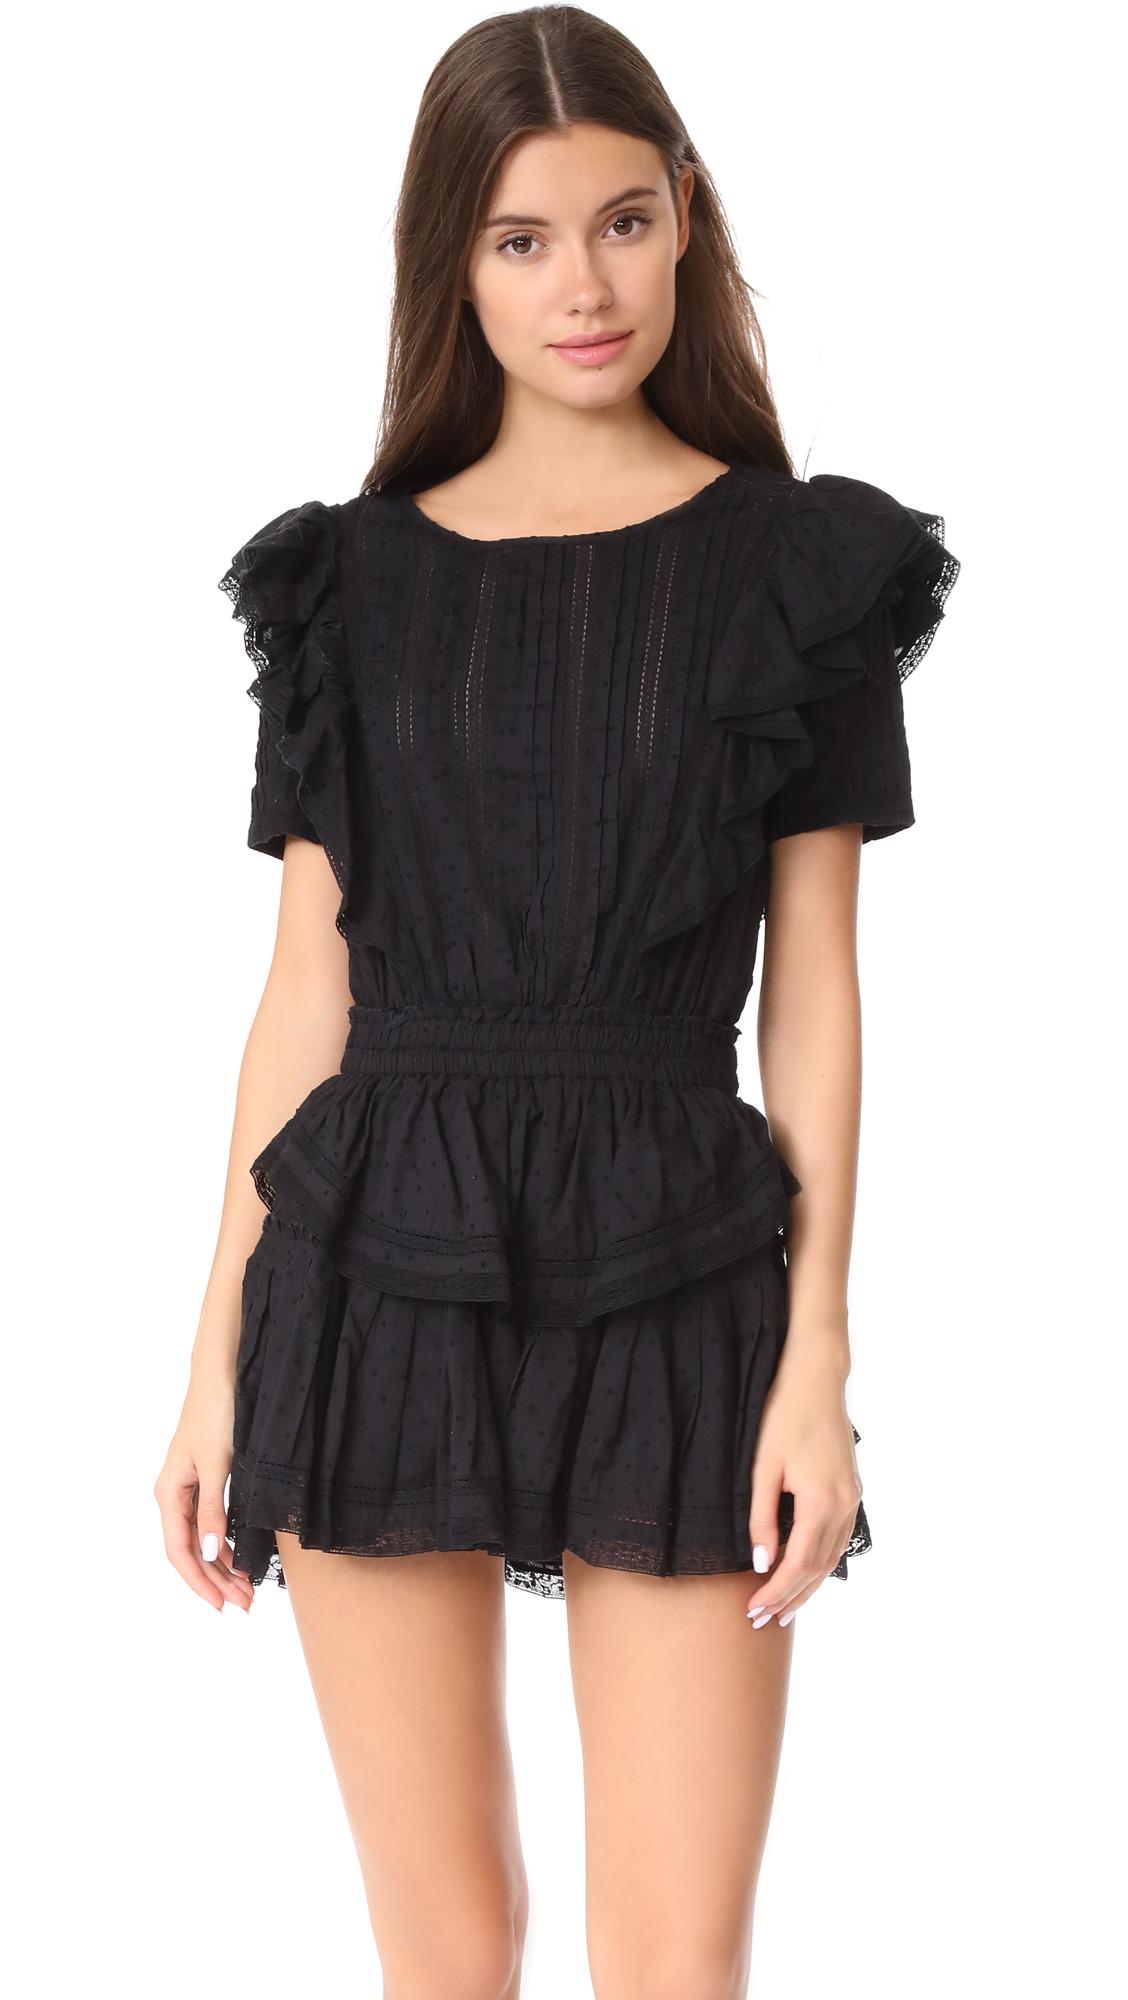 LOVESHACKFANCY Natasha Dress - Black